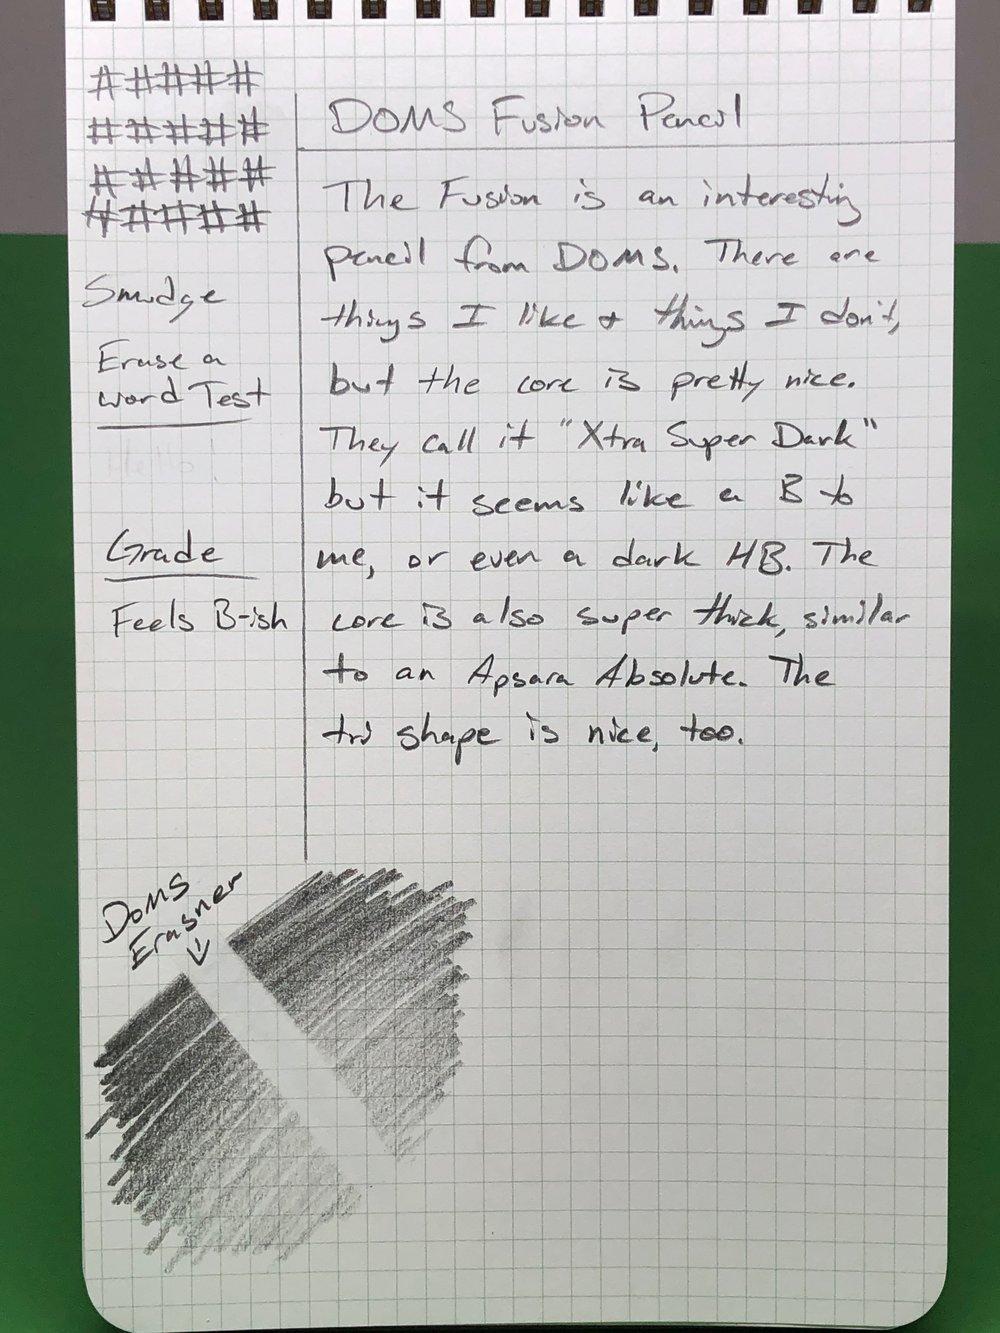 doms-fusion-pencil-12.jpg